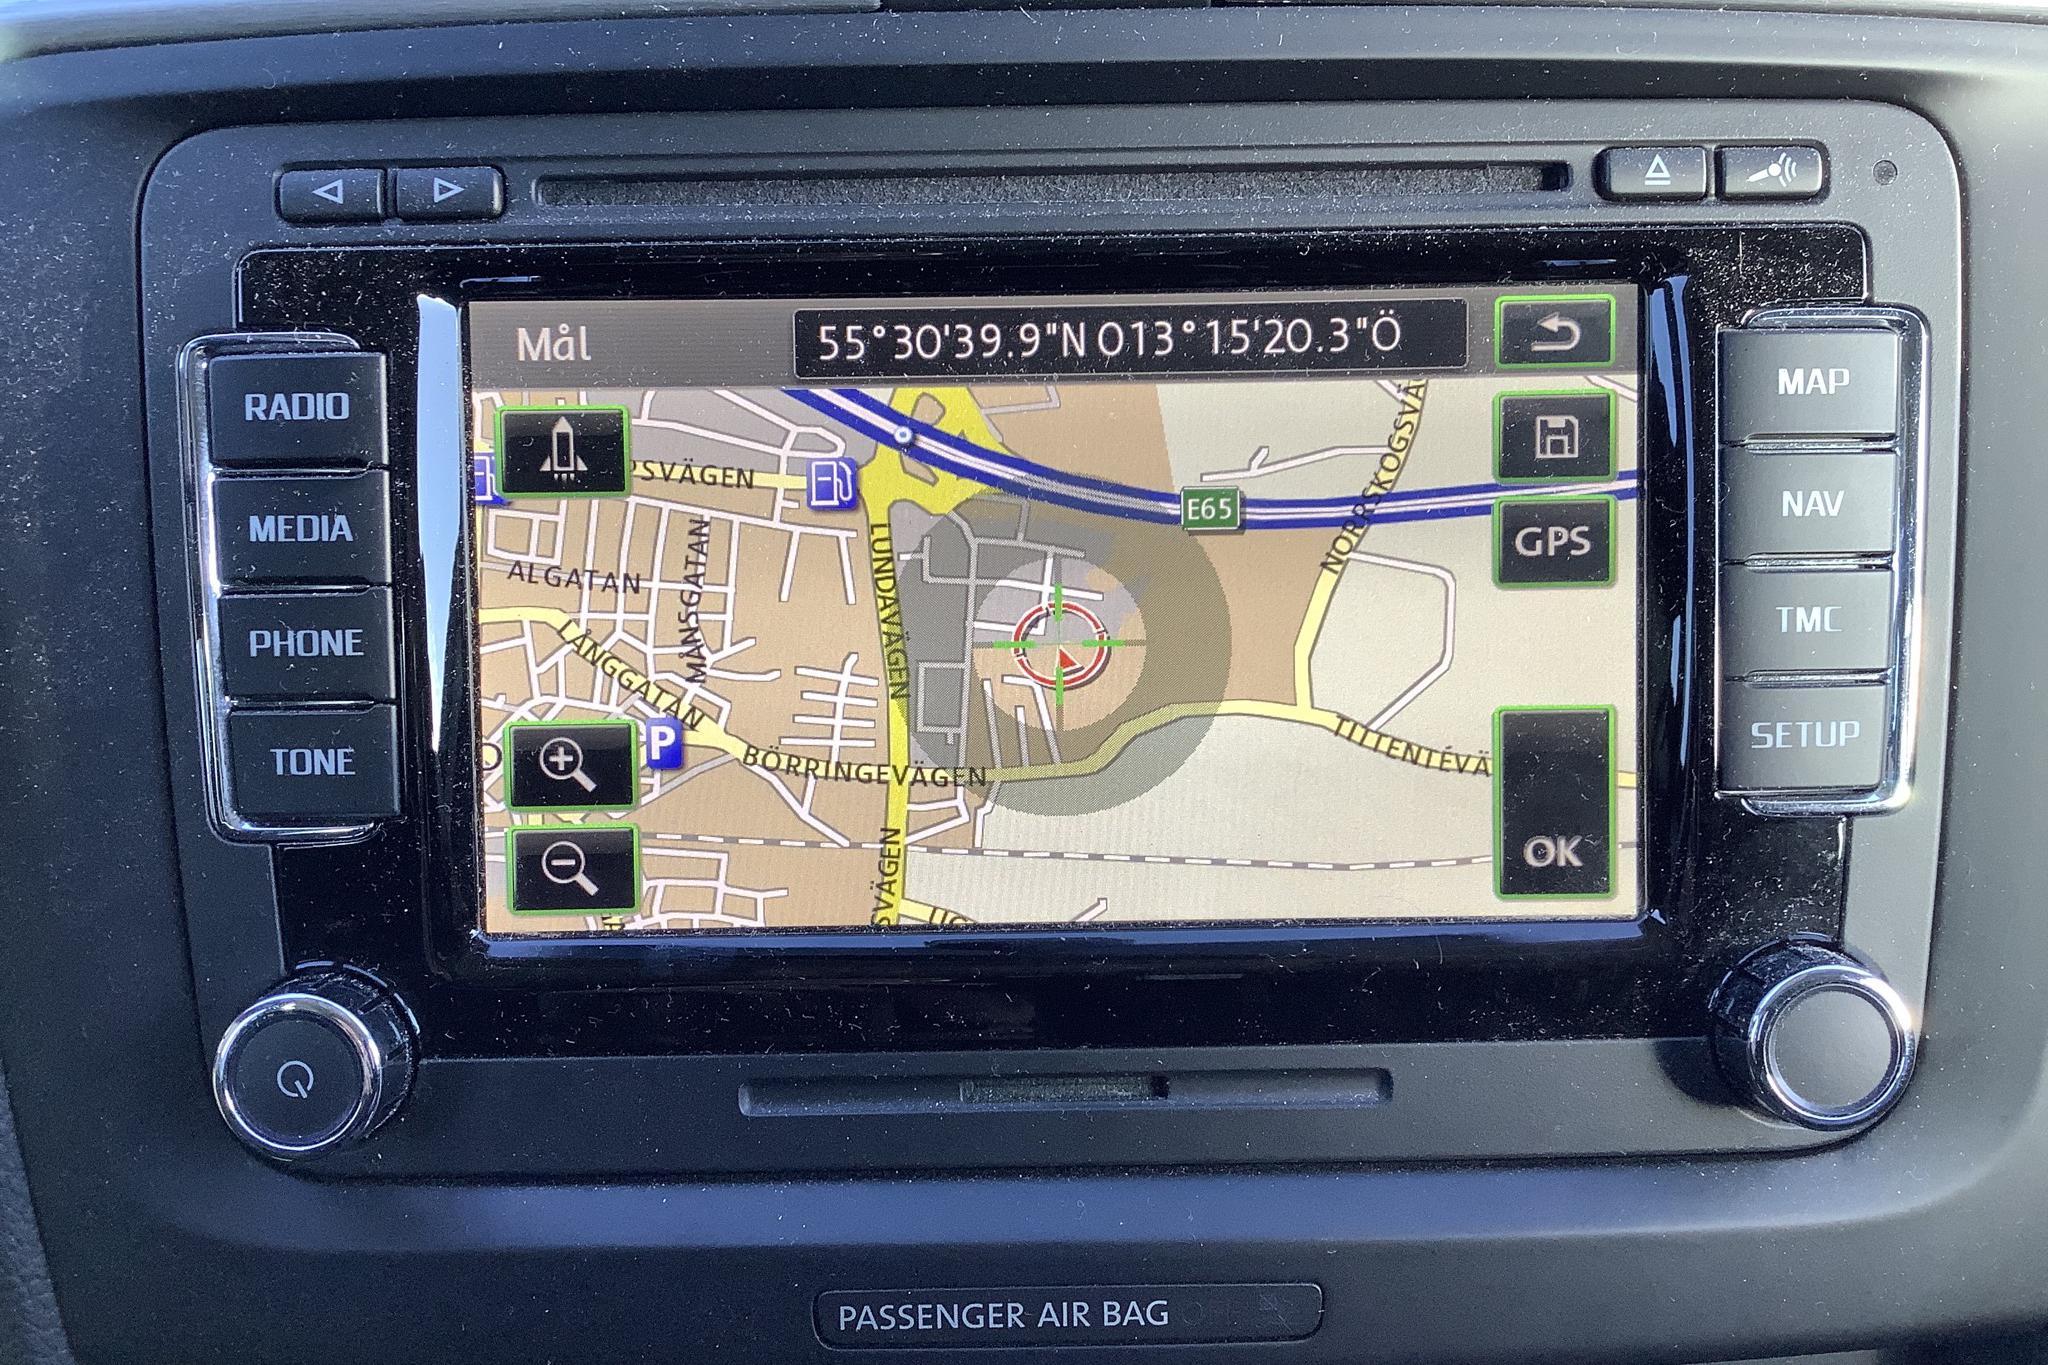 Skoda Superb 2.0 TDI Kombi (170hk) - 112 300 km - Automatic - black - 2014